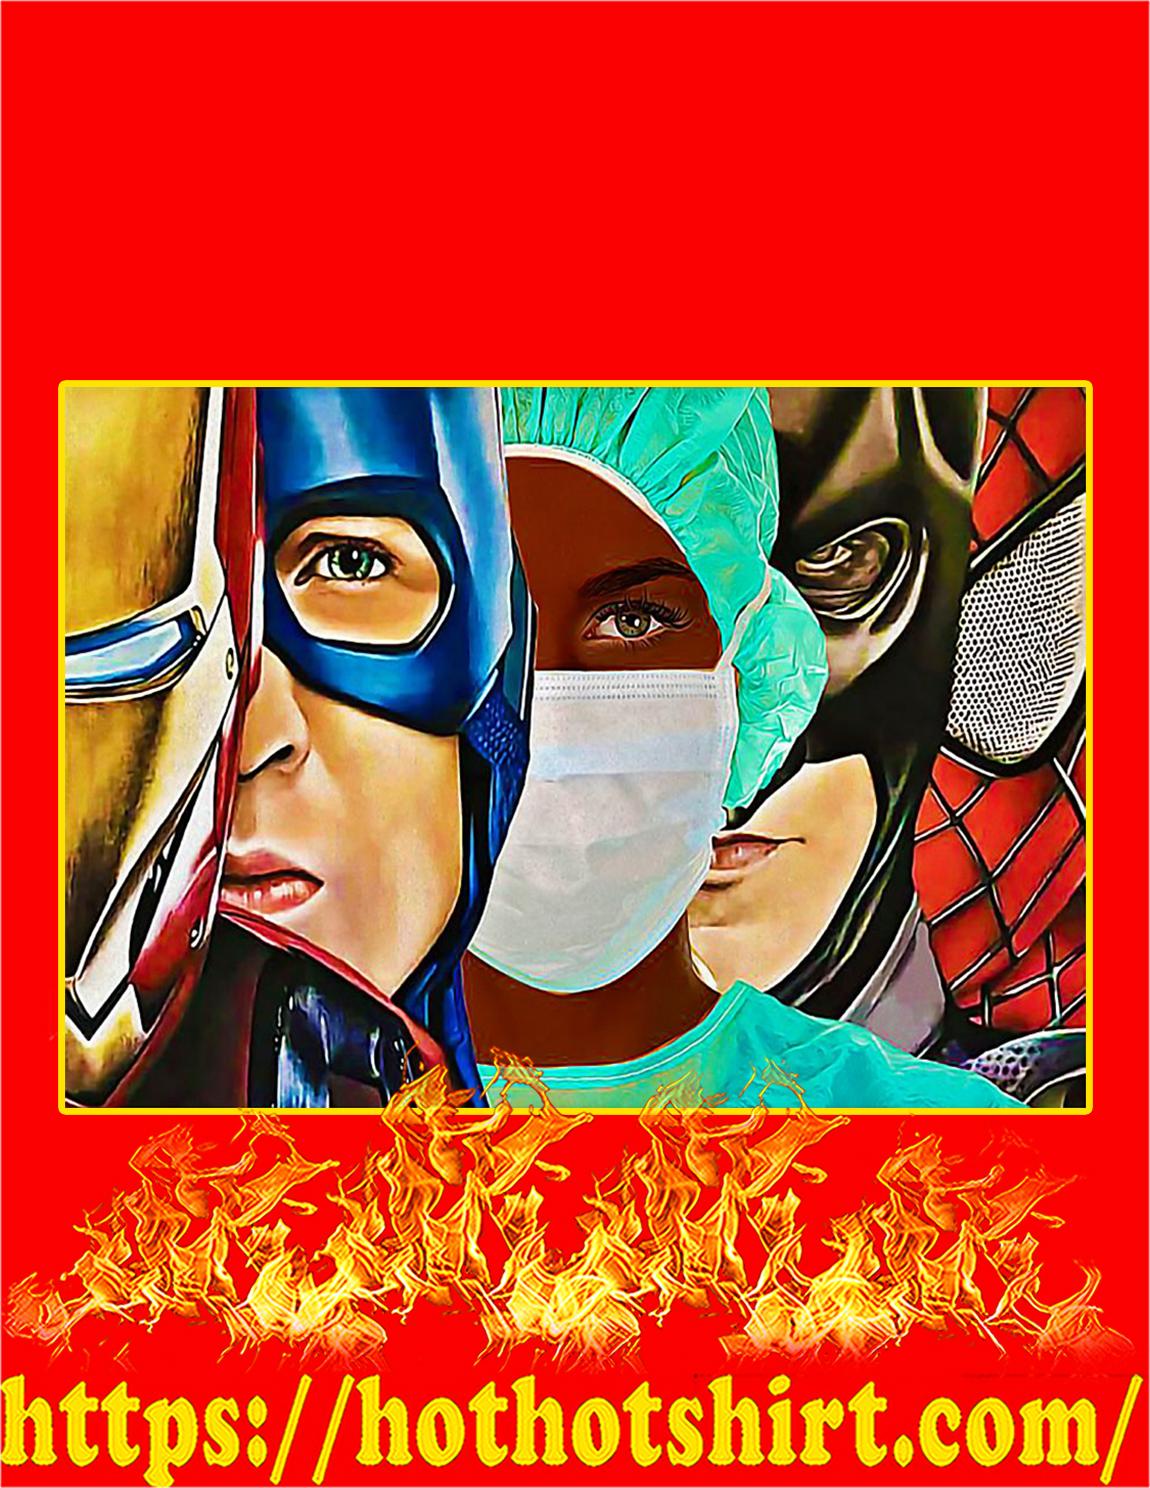 Black Nurse Superheroes Iron Man Poster - A4